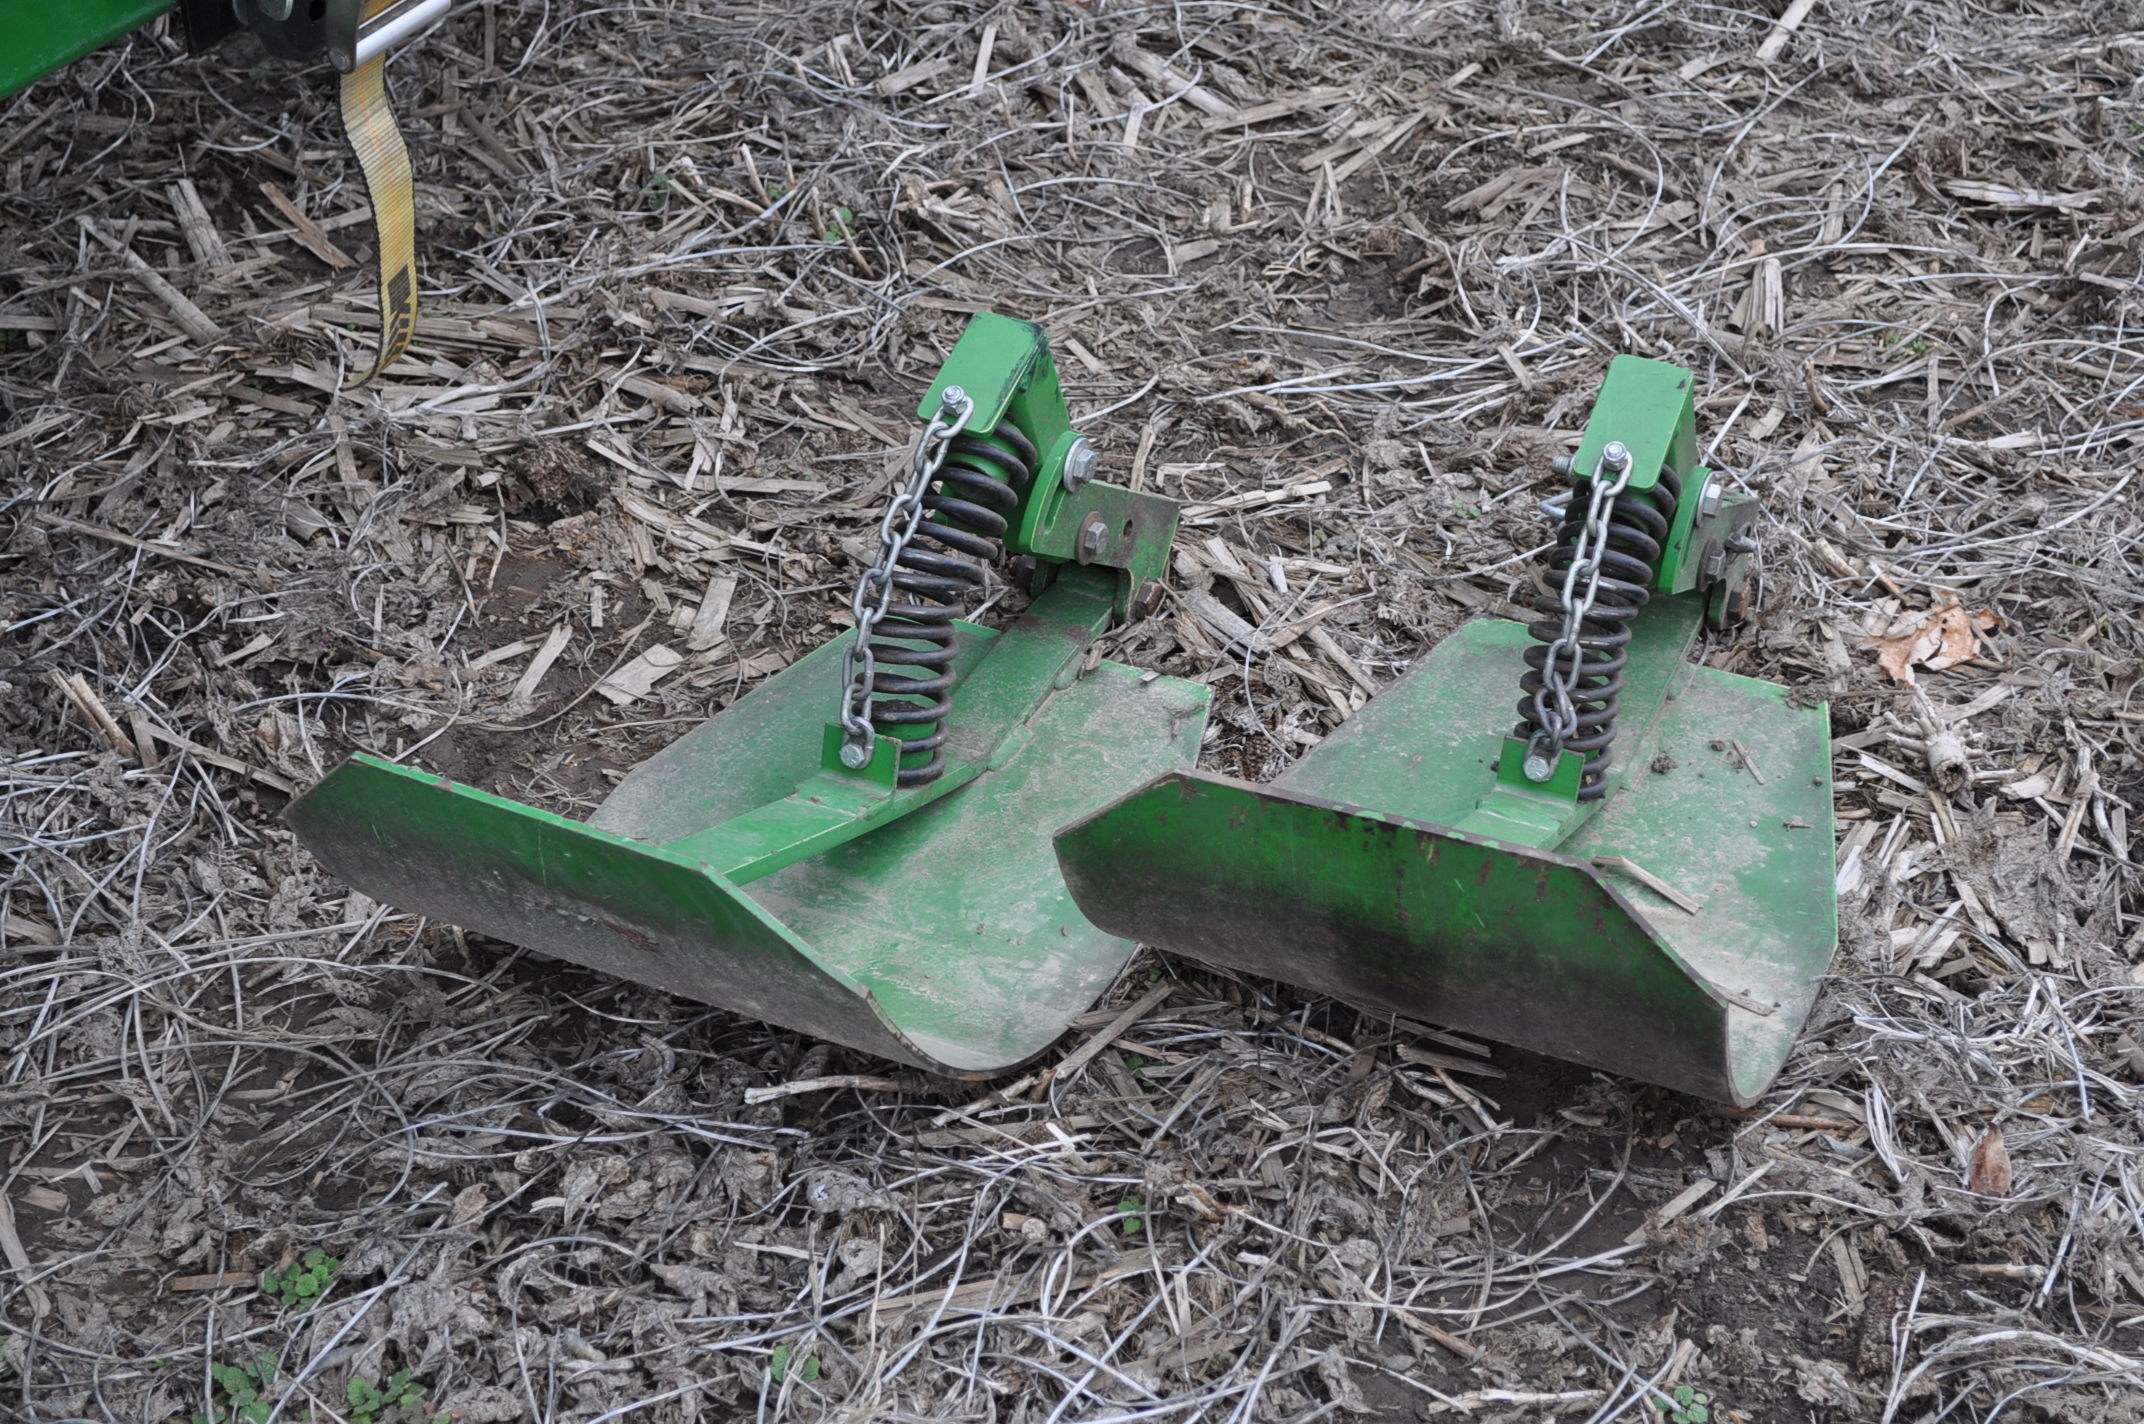 John Deere 693 corn head, poly, hyd drive, down corn reel, pto shafts, SN 655654 - Image 5 of 17